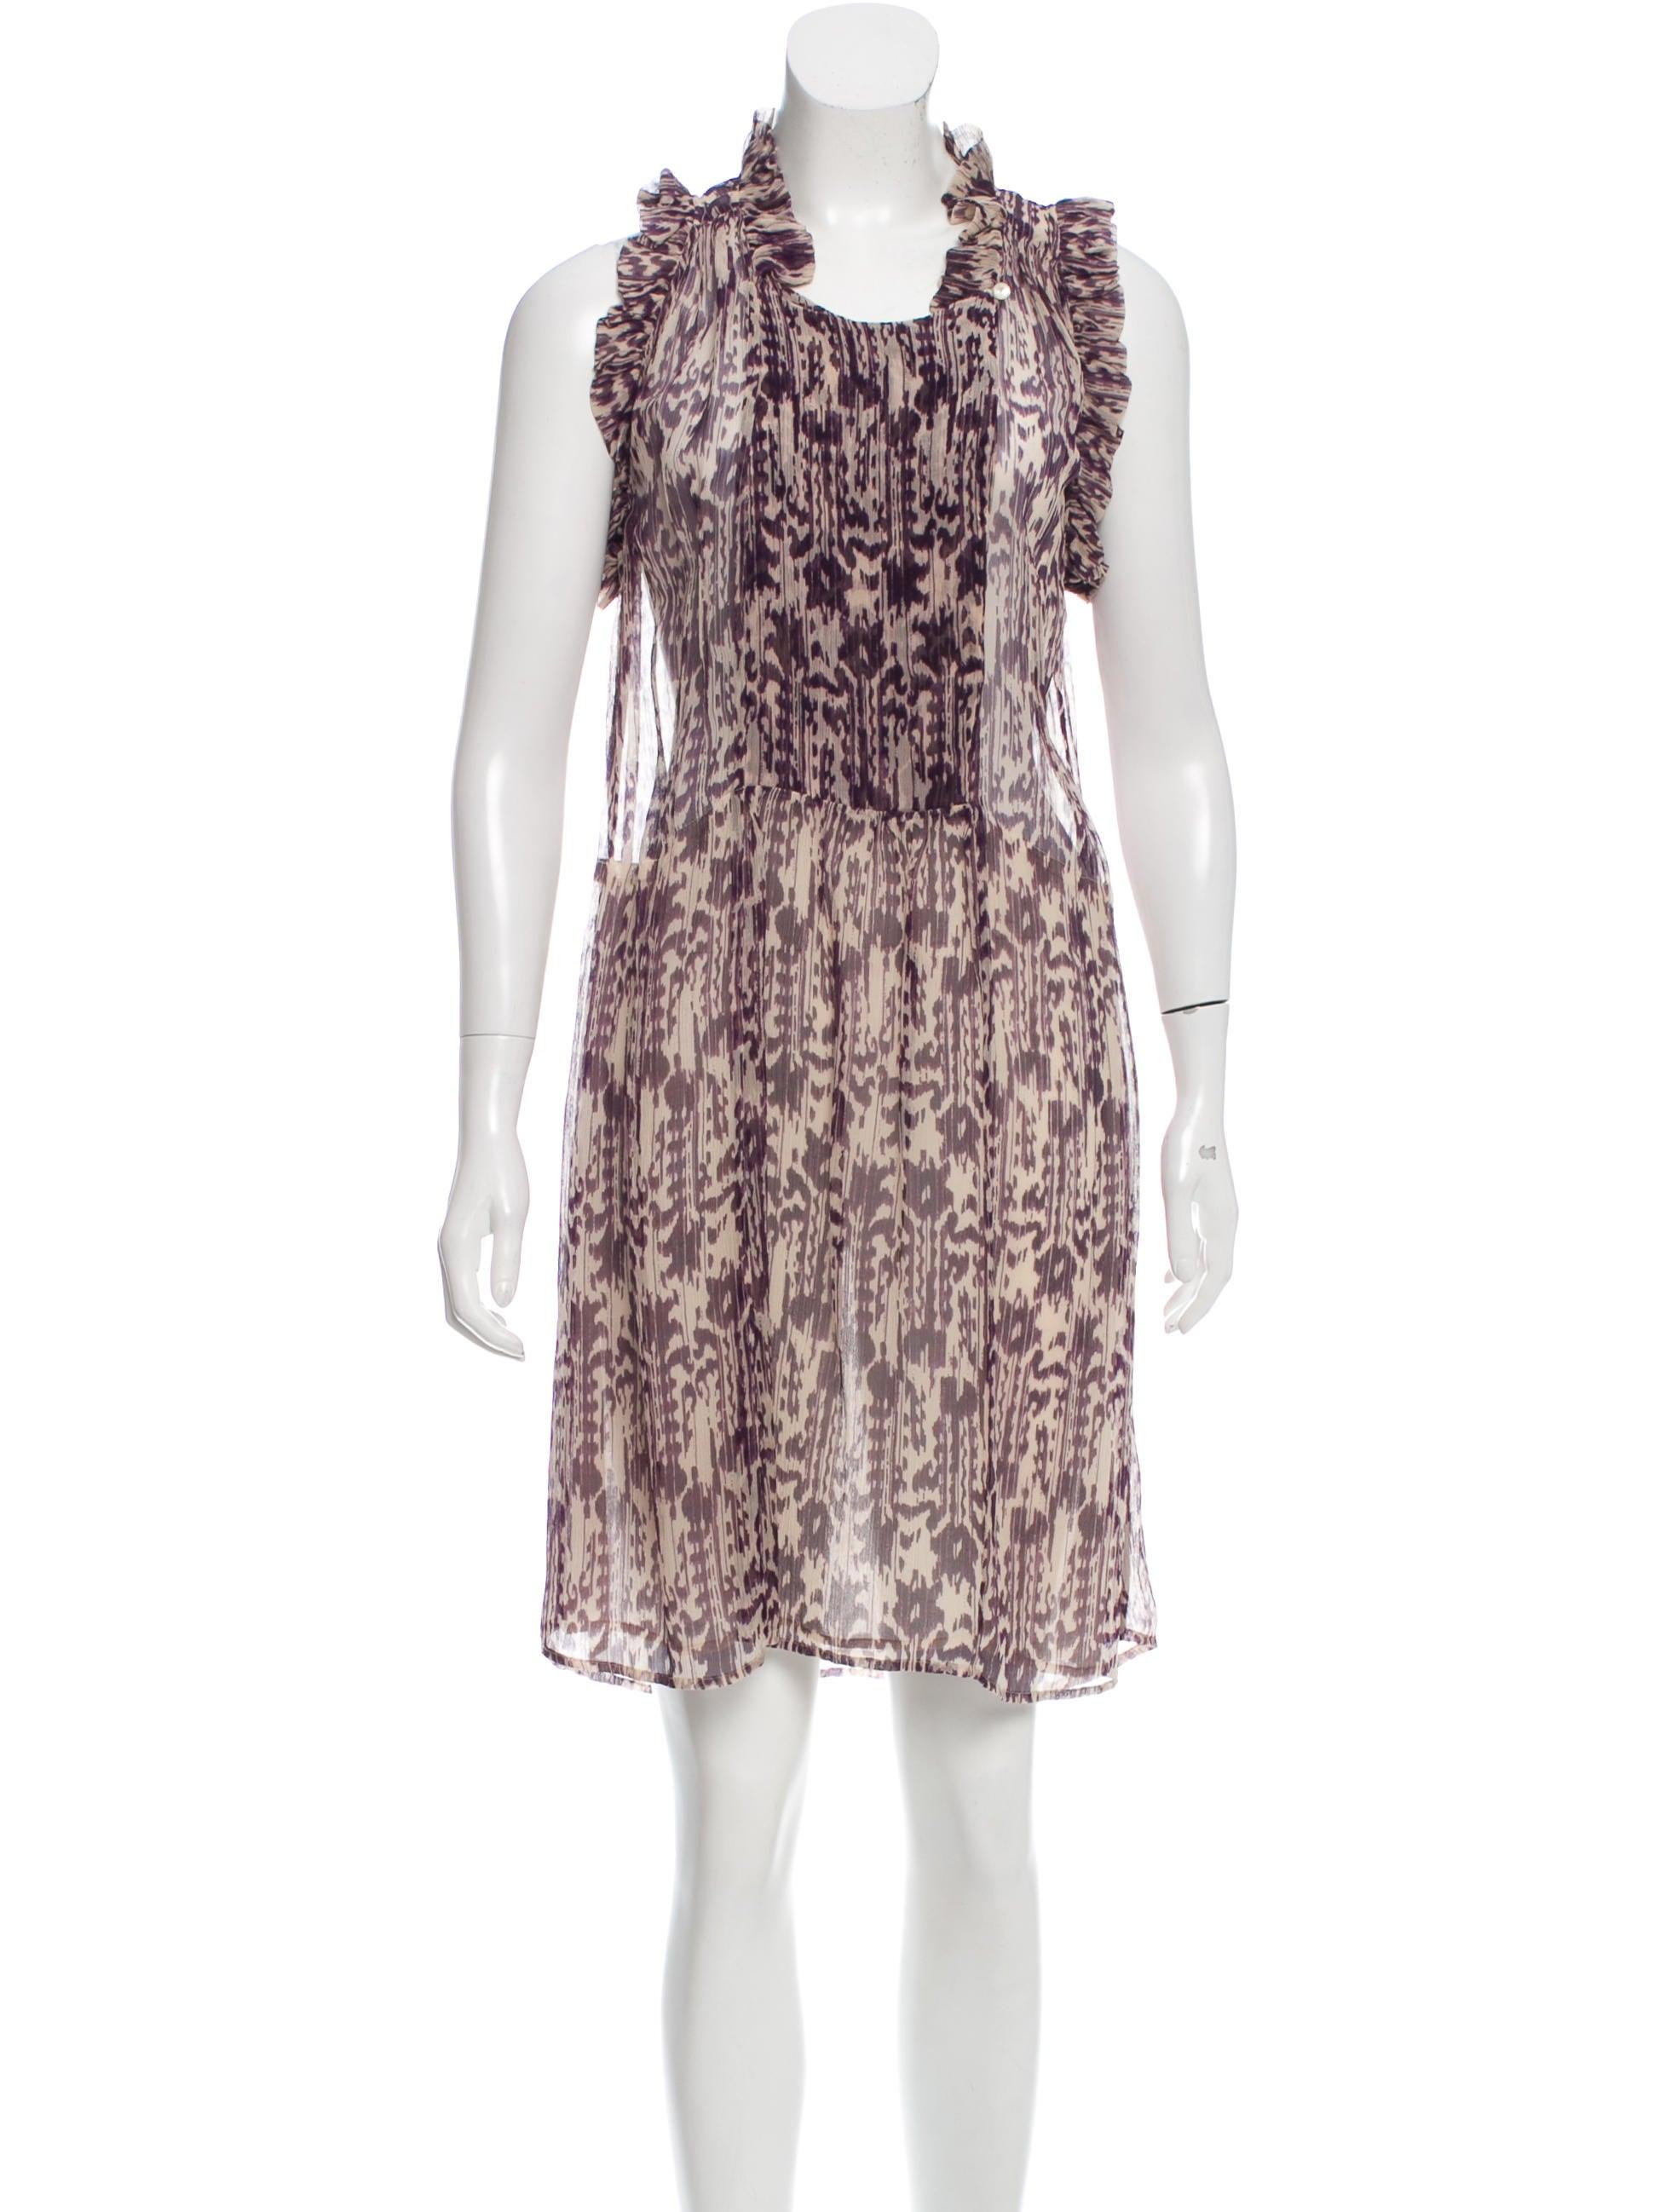 Toile isabel marant printed pliss dress clothing for Isabel marant shirt dress